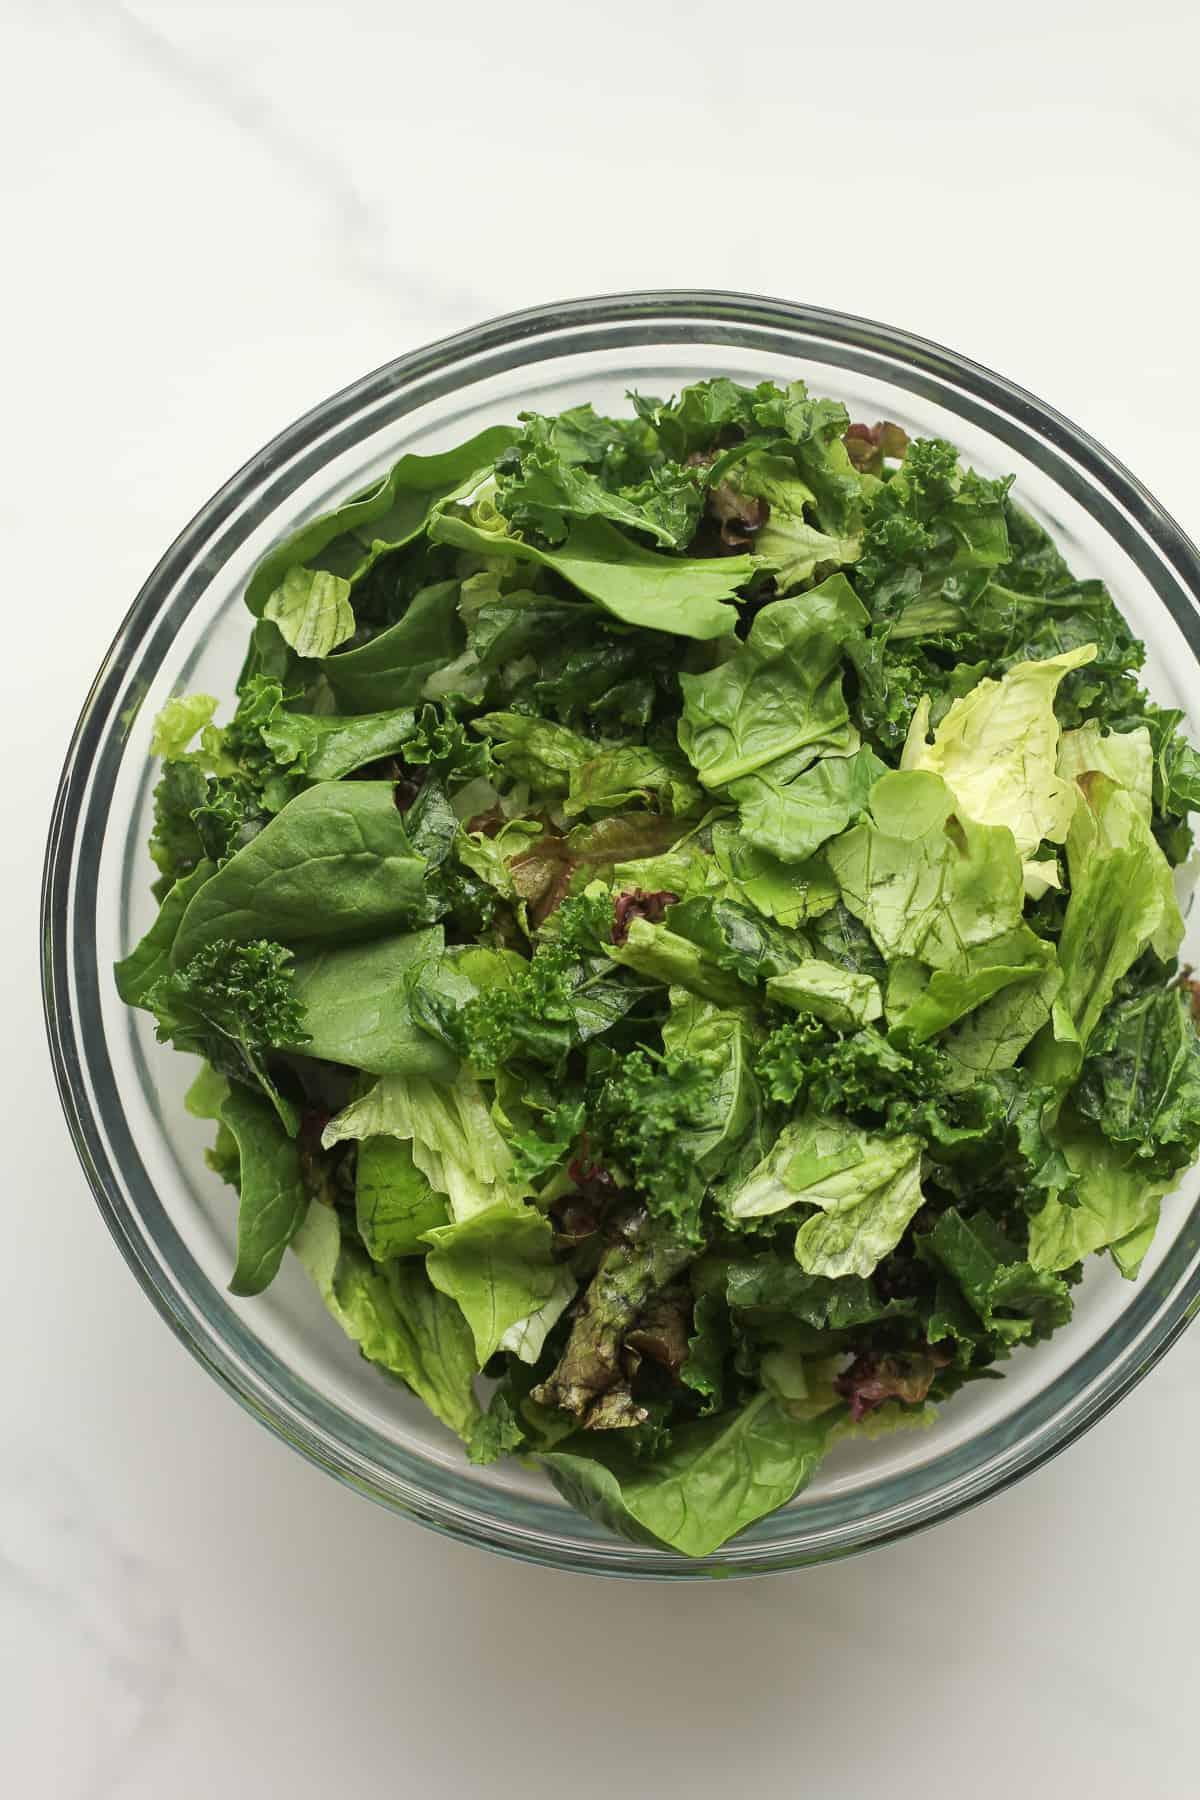 A bowl of a variety of salad greens.